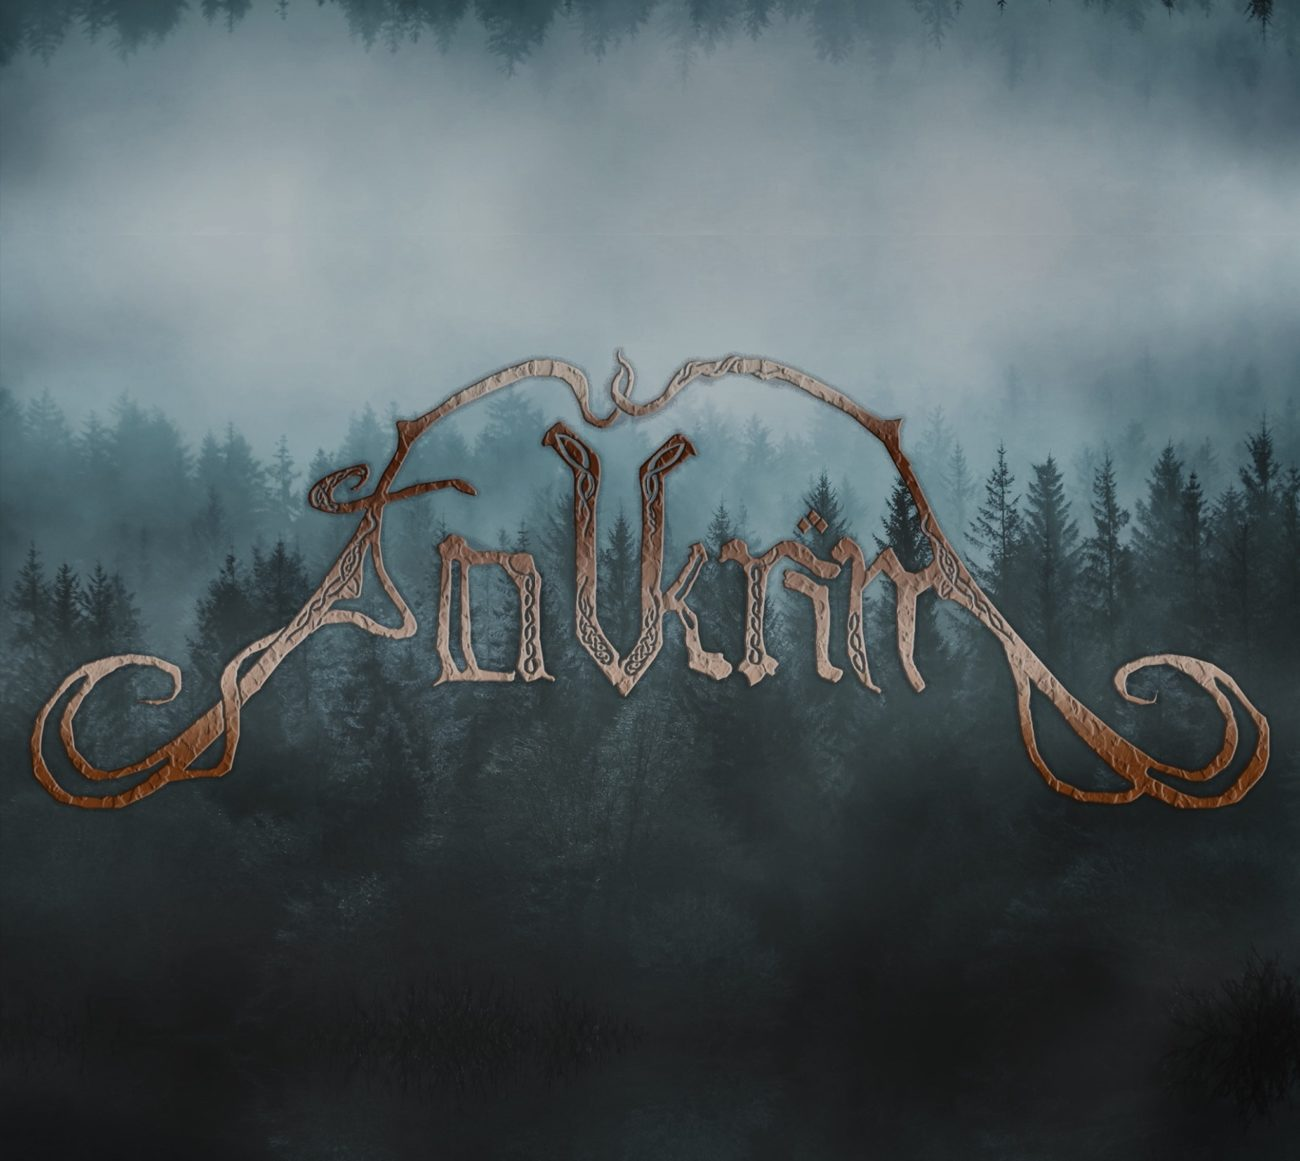 Folkrim tarjoilee utta folkmetallia Raumalta